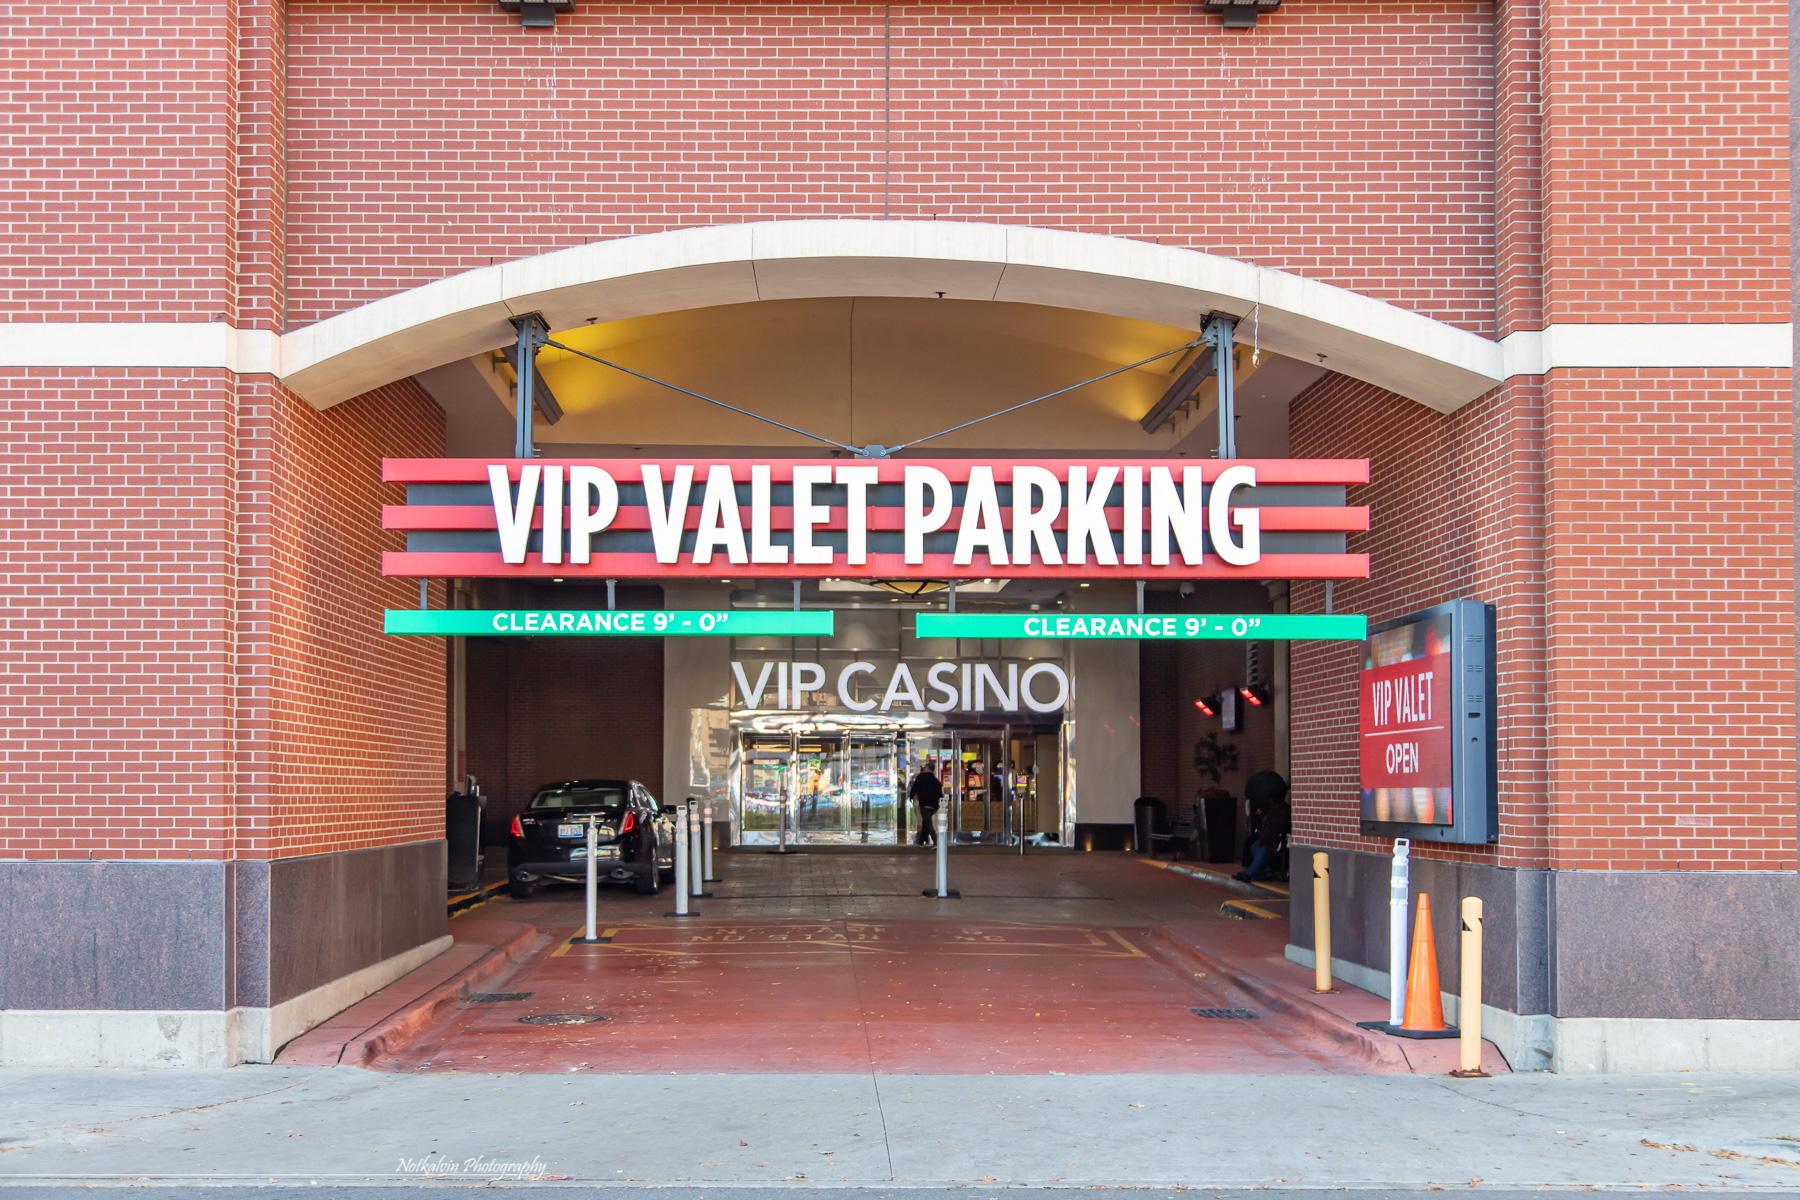 VIP Valet Parking - 1z3a8583